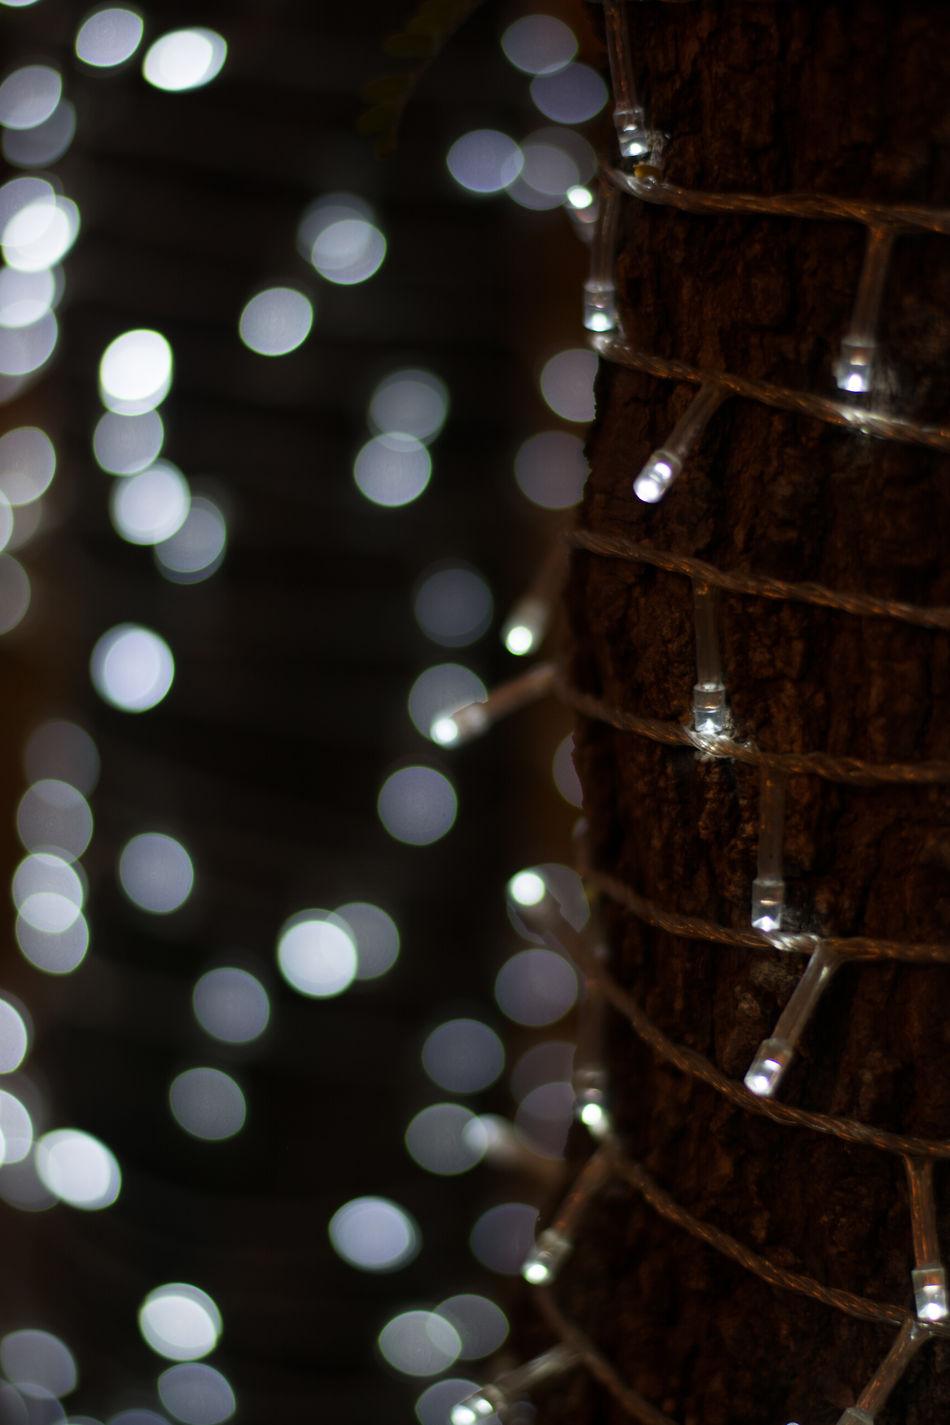 Bokeh Photography Bokeh Lights Bokeheffect Bokeh Bokehlicious Photography Bokeh Balls Bokeh Bubbles Bokeh Background Bokeh On Foreground Bokeh Nature Bokehgraphy Bokeh Night Bokeh Blast Boken Photo Boken Nature Light And Shadows Light In The Darkness Macro Photography Outdoors Full Frame Color Boke